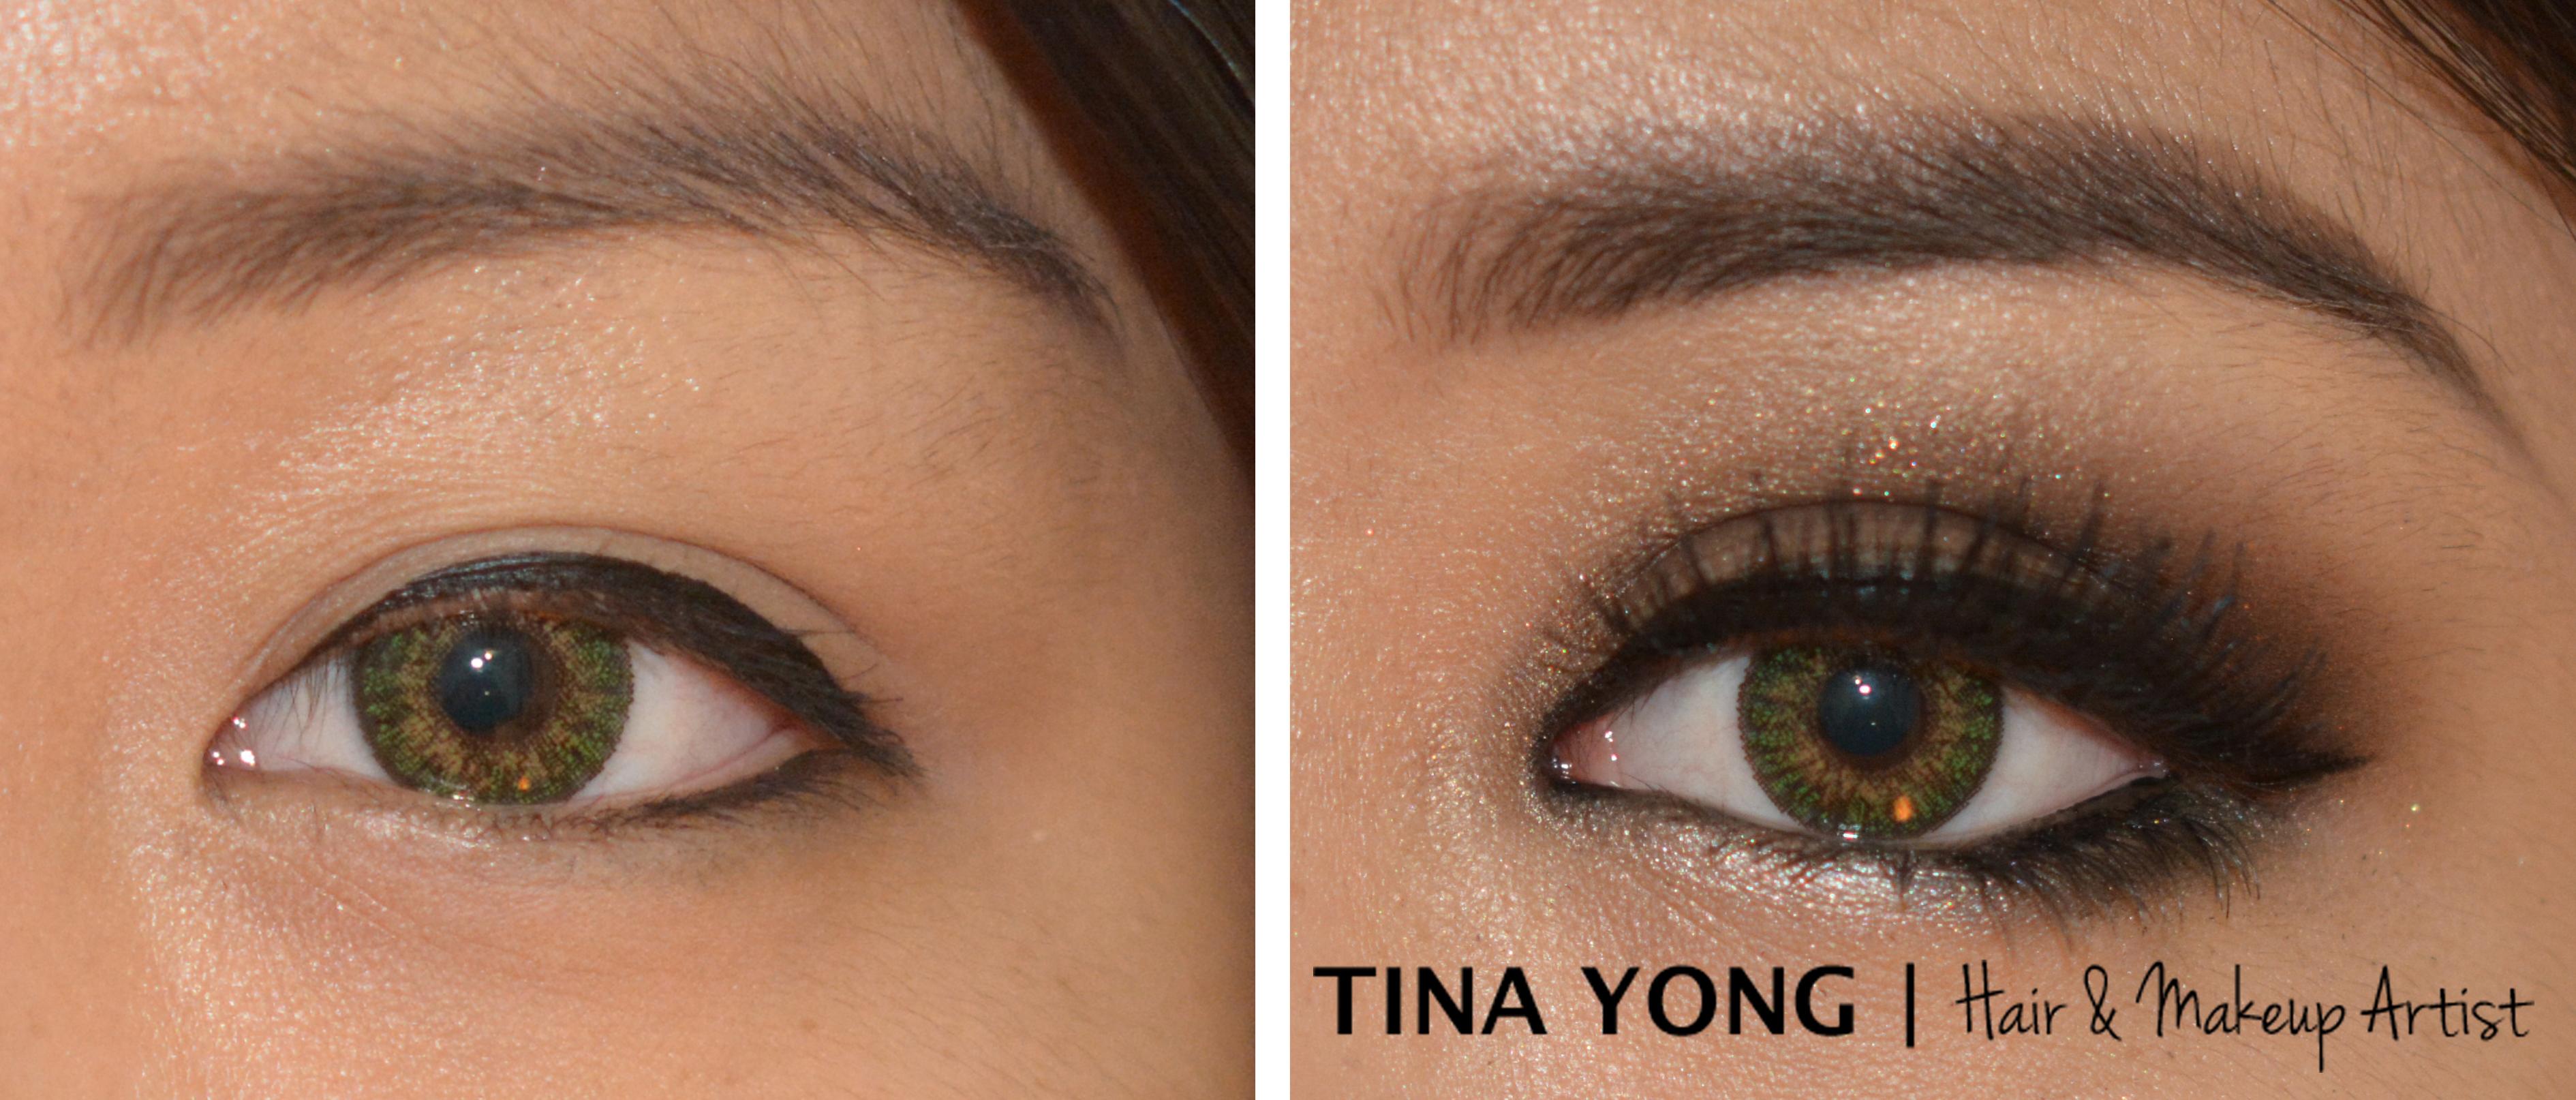 Asian Smokey Eye Page 2 Tina Yong